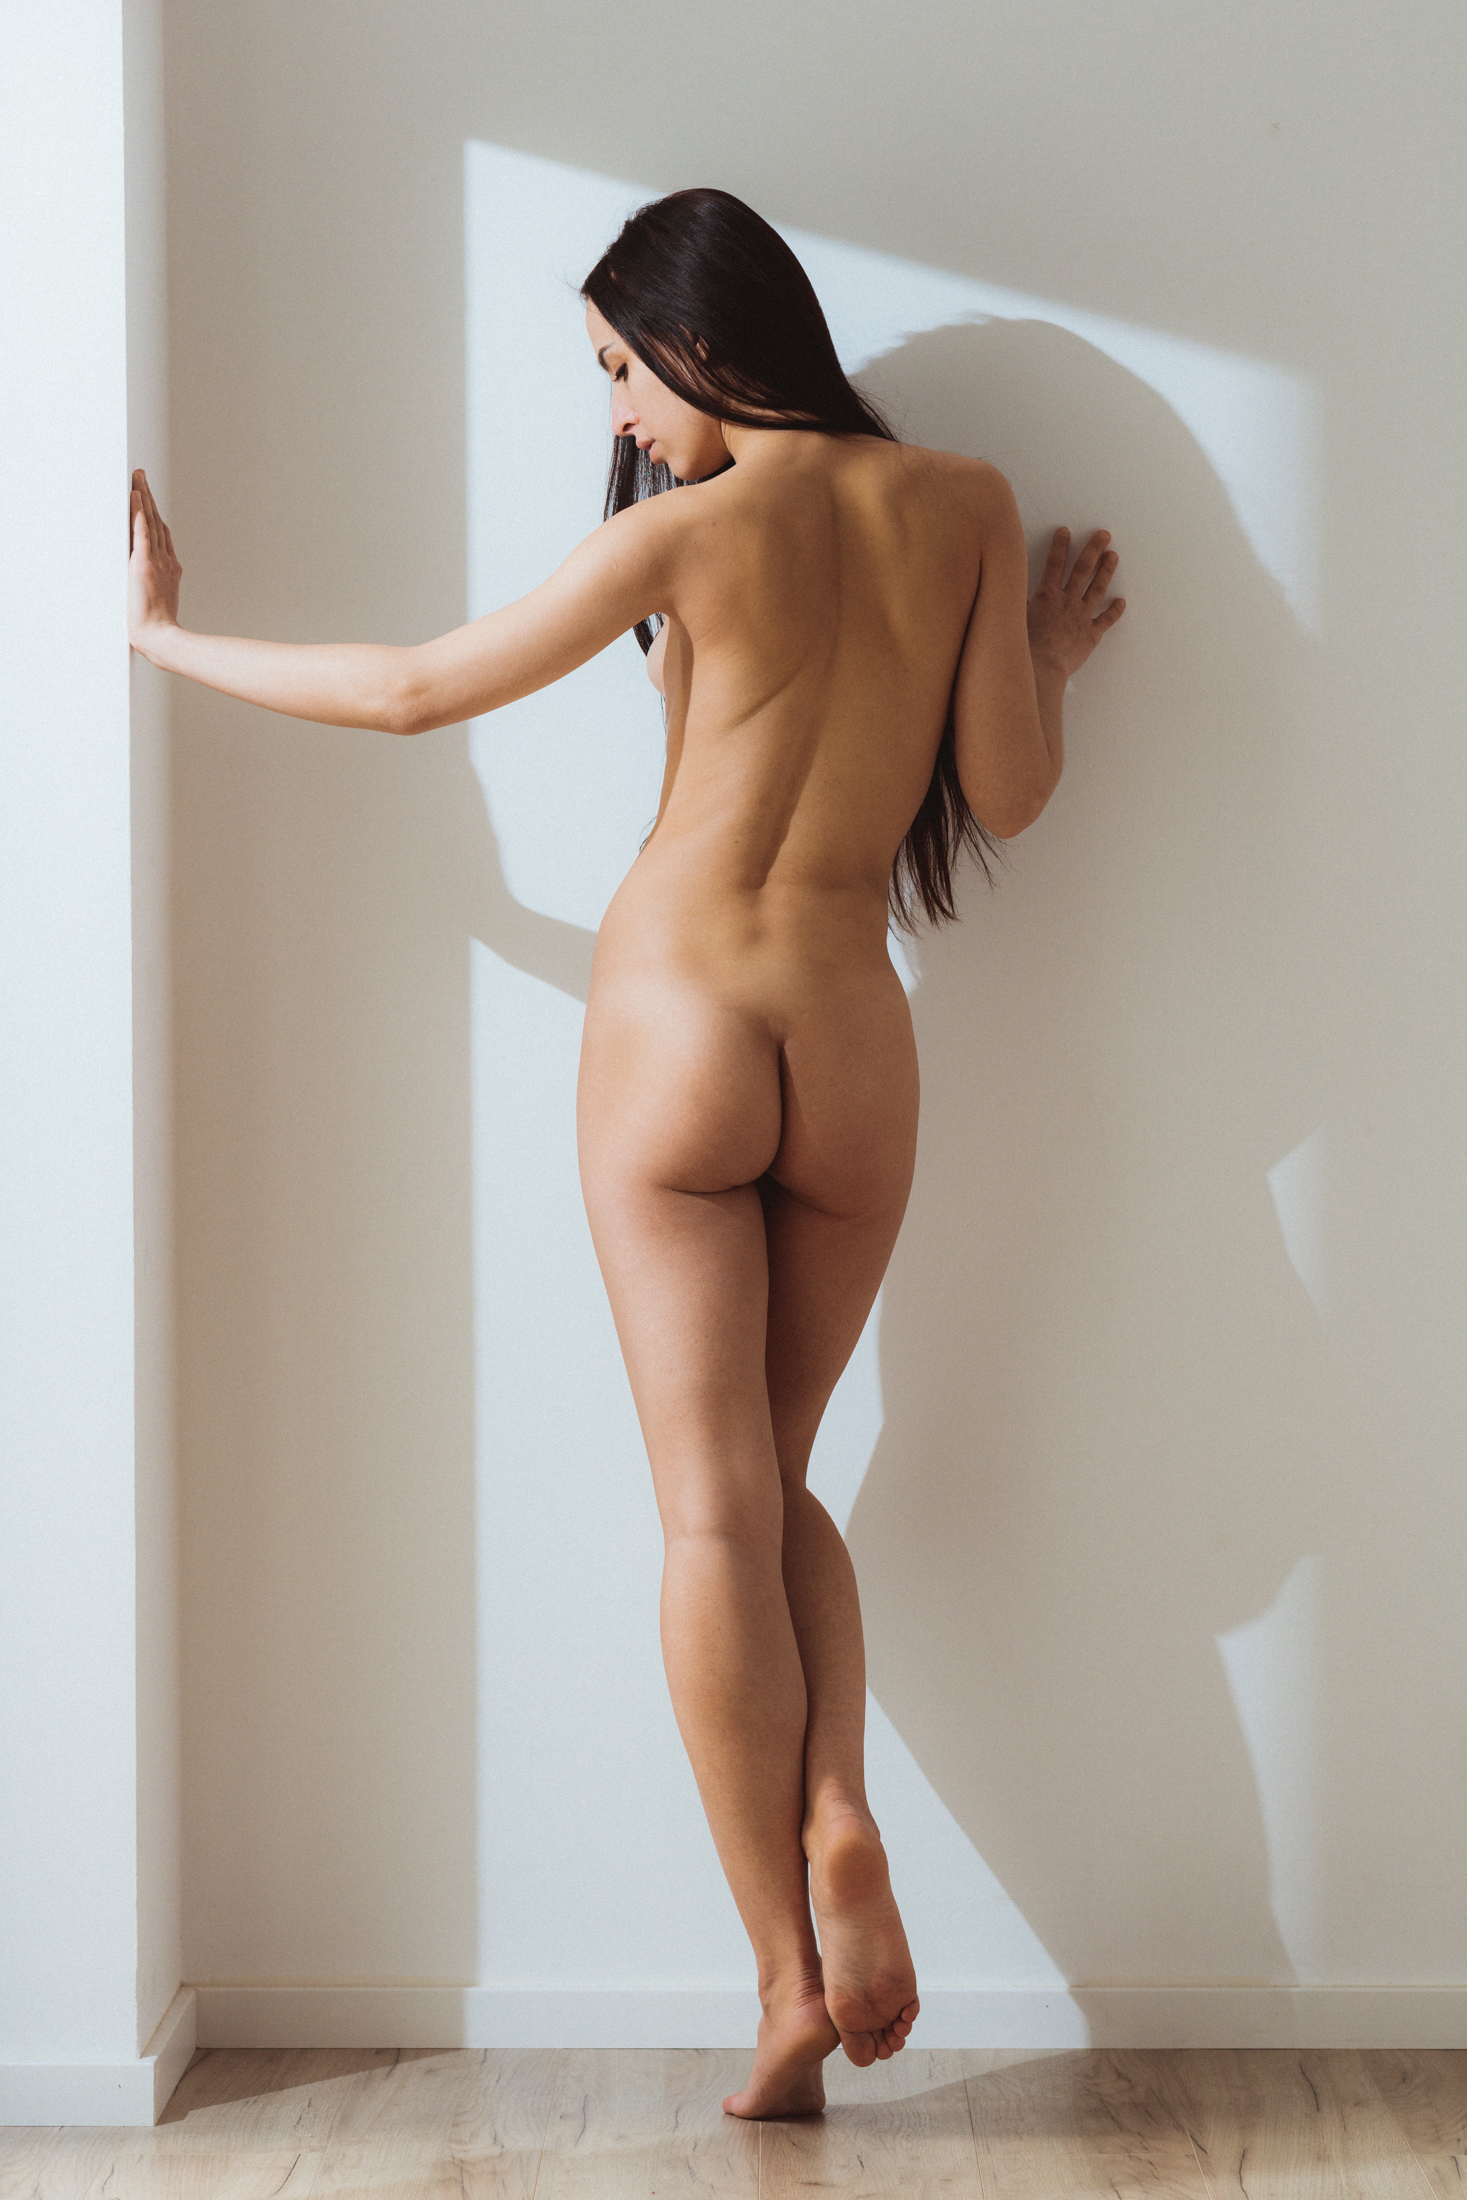 olenka art nude portrait in studio frankfurt 06